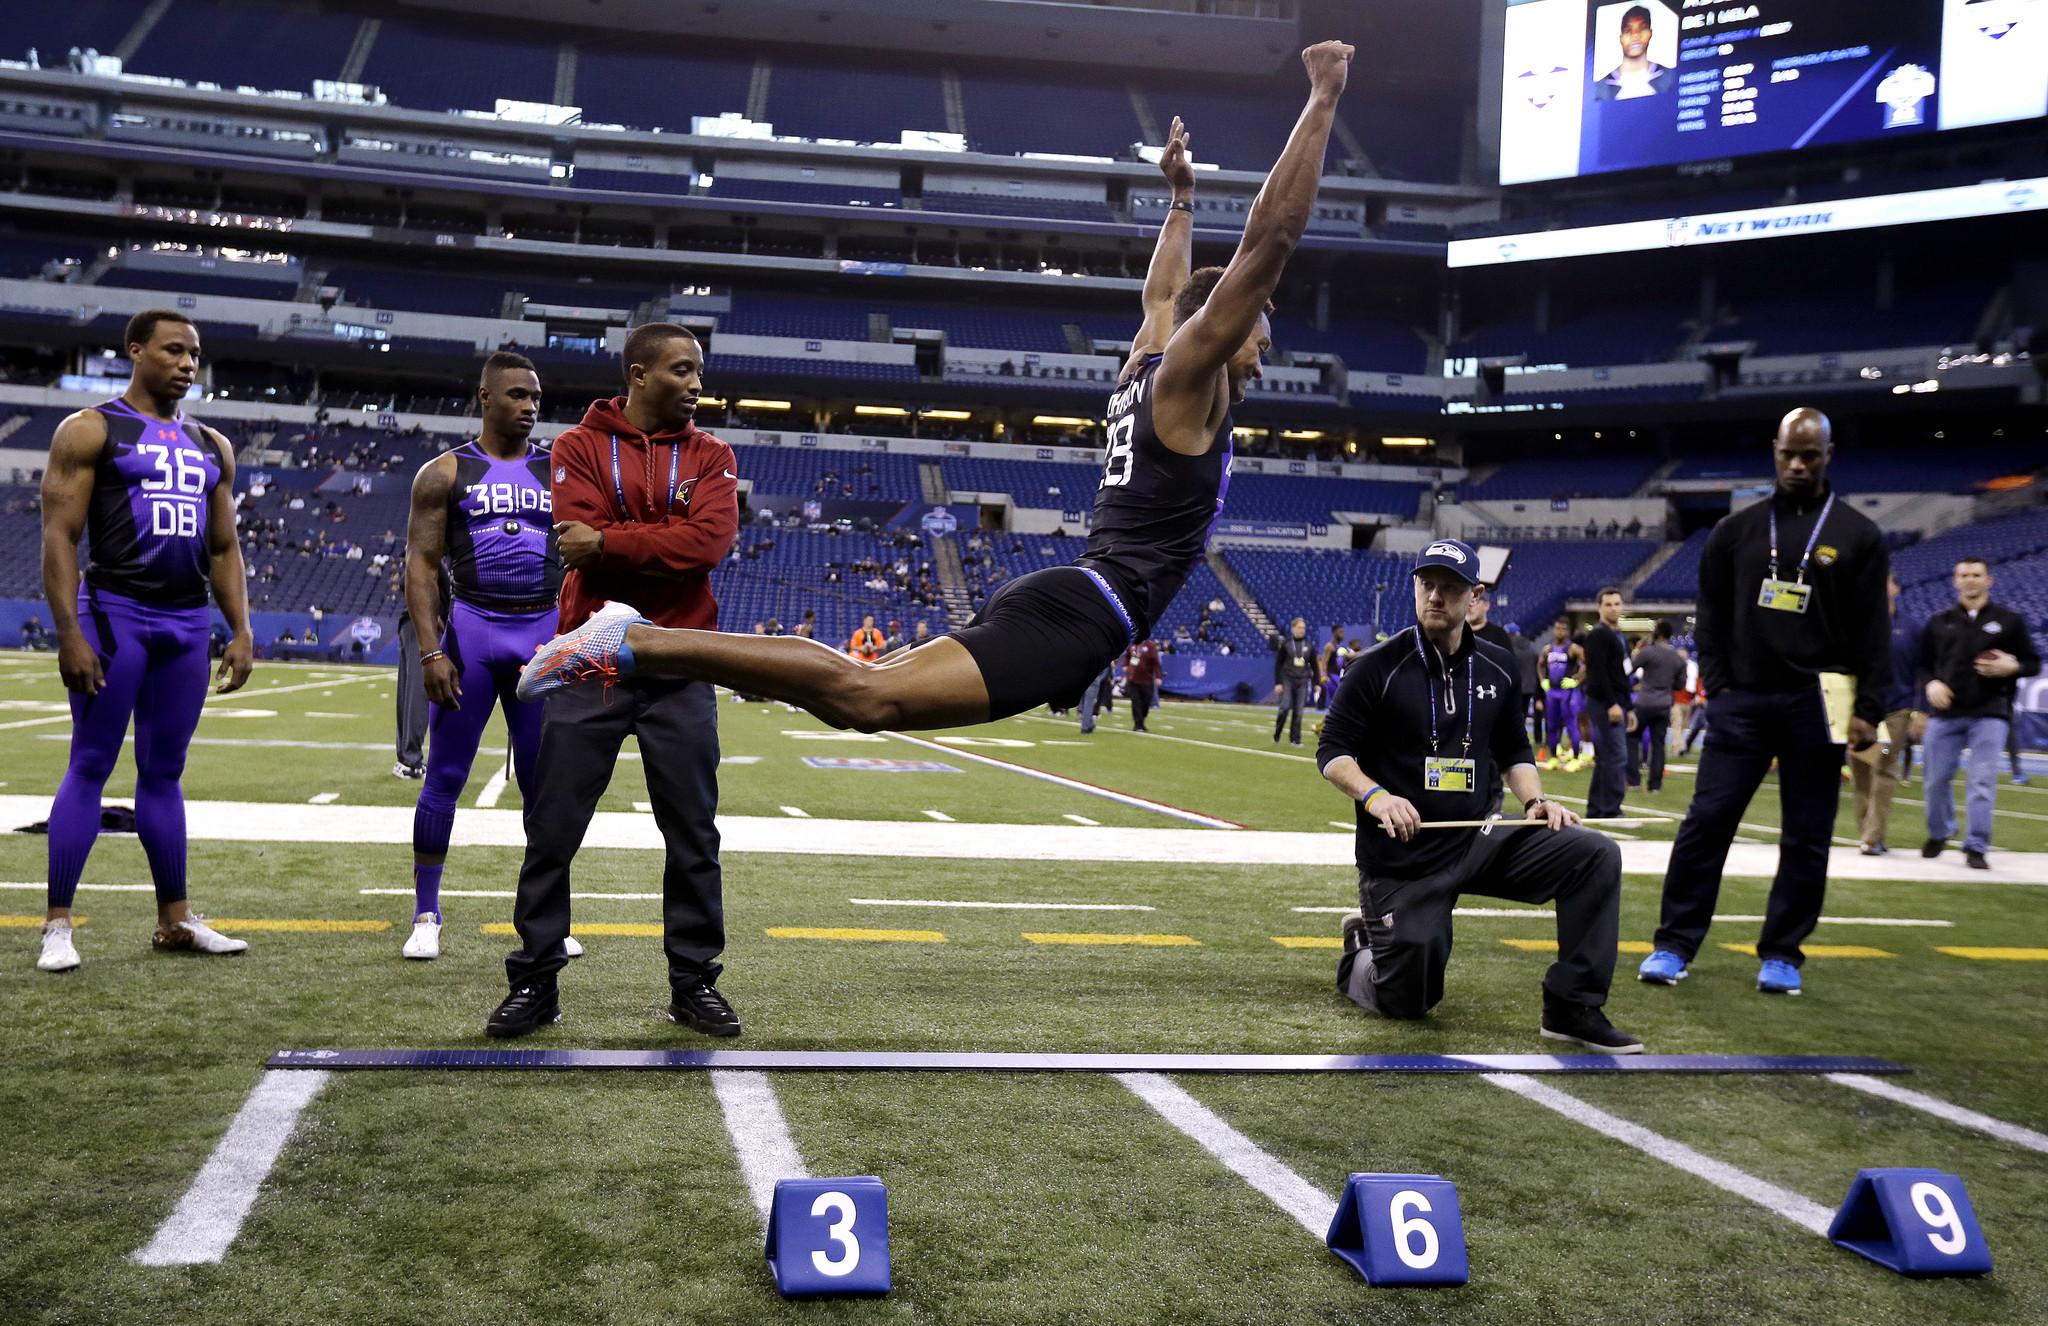 UConn's Byron Jones Sets Broad Jump World Record At NFL ...